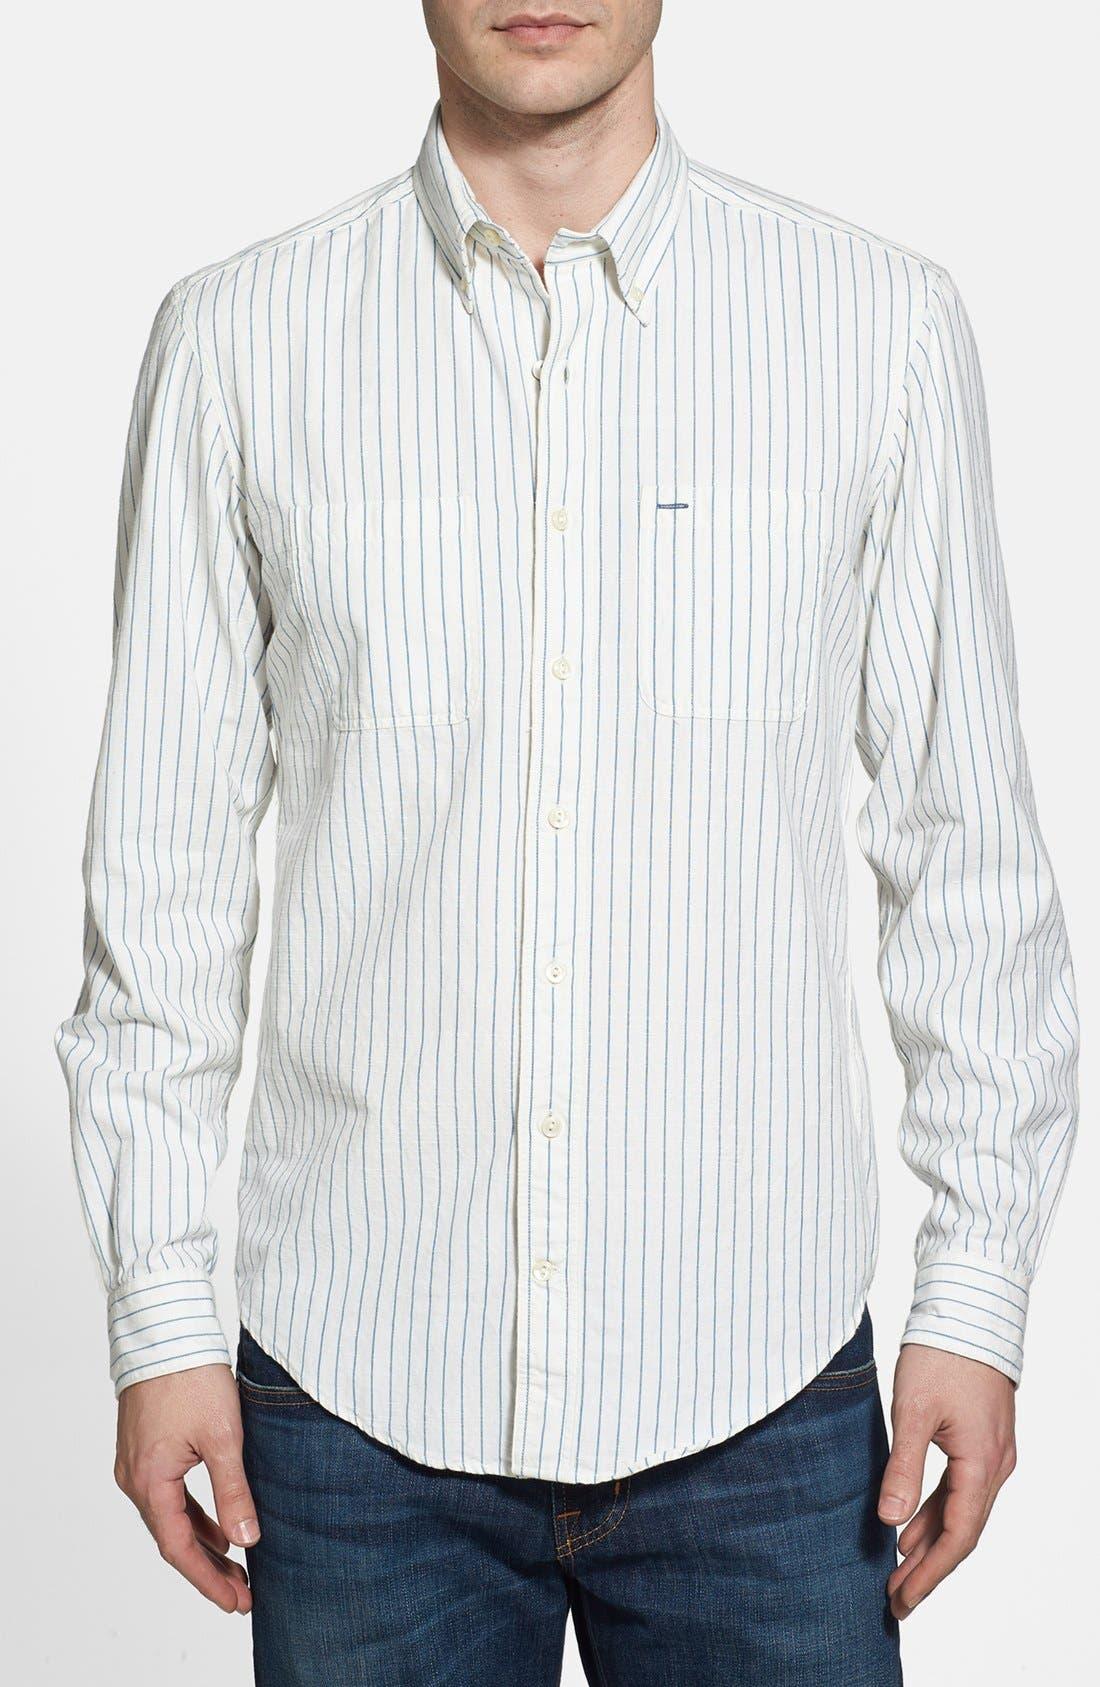 Main Image - Gant 'O.P. Indigo Stripe' Sport Shirt